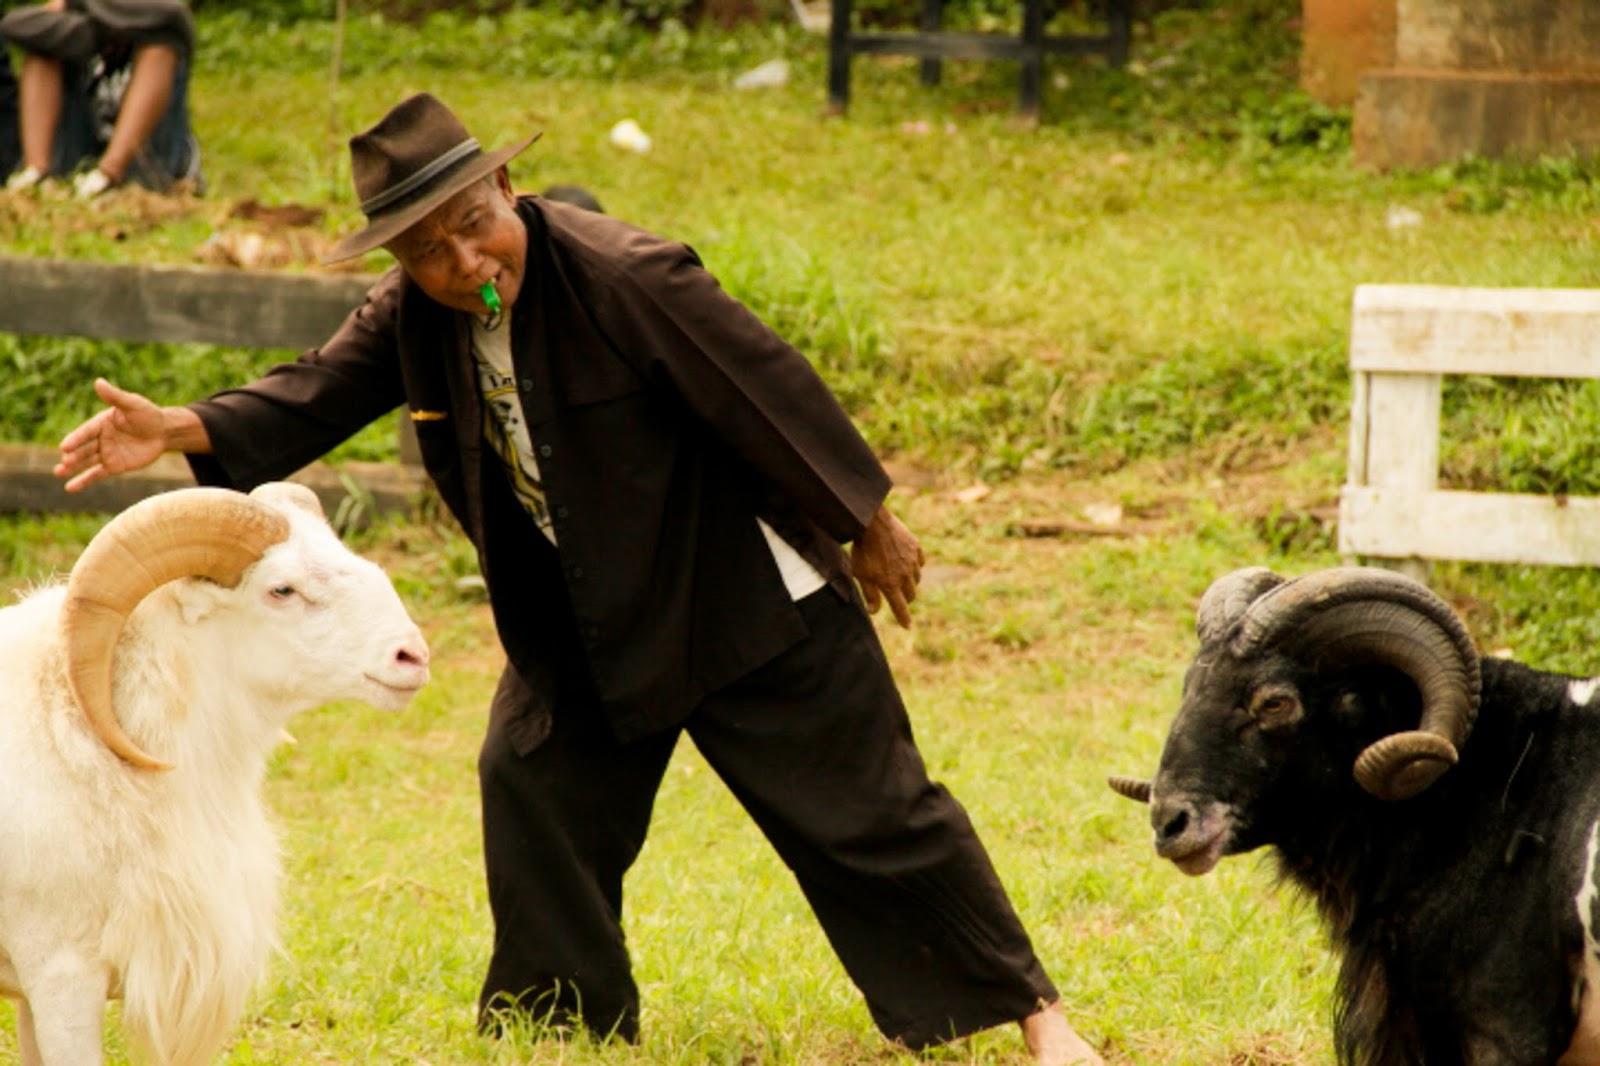 Tradisi Adu Domba Di Cijaringao   Elekesekeng with regard to Gambar Domba Diadu